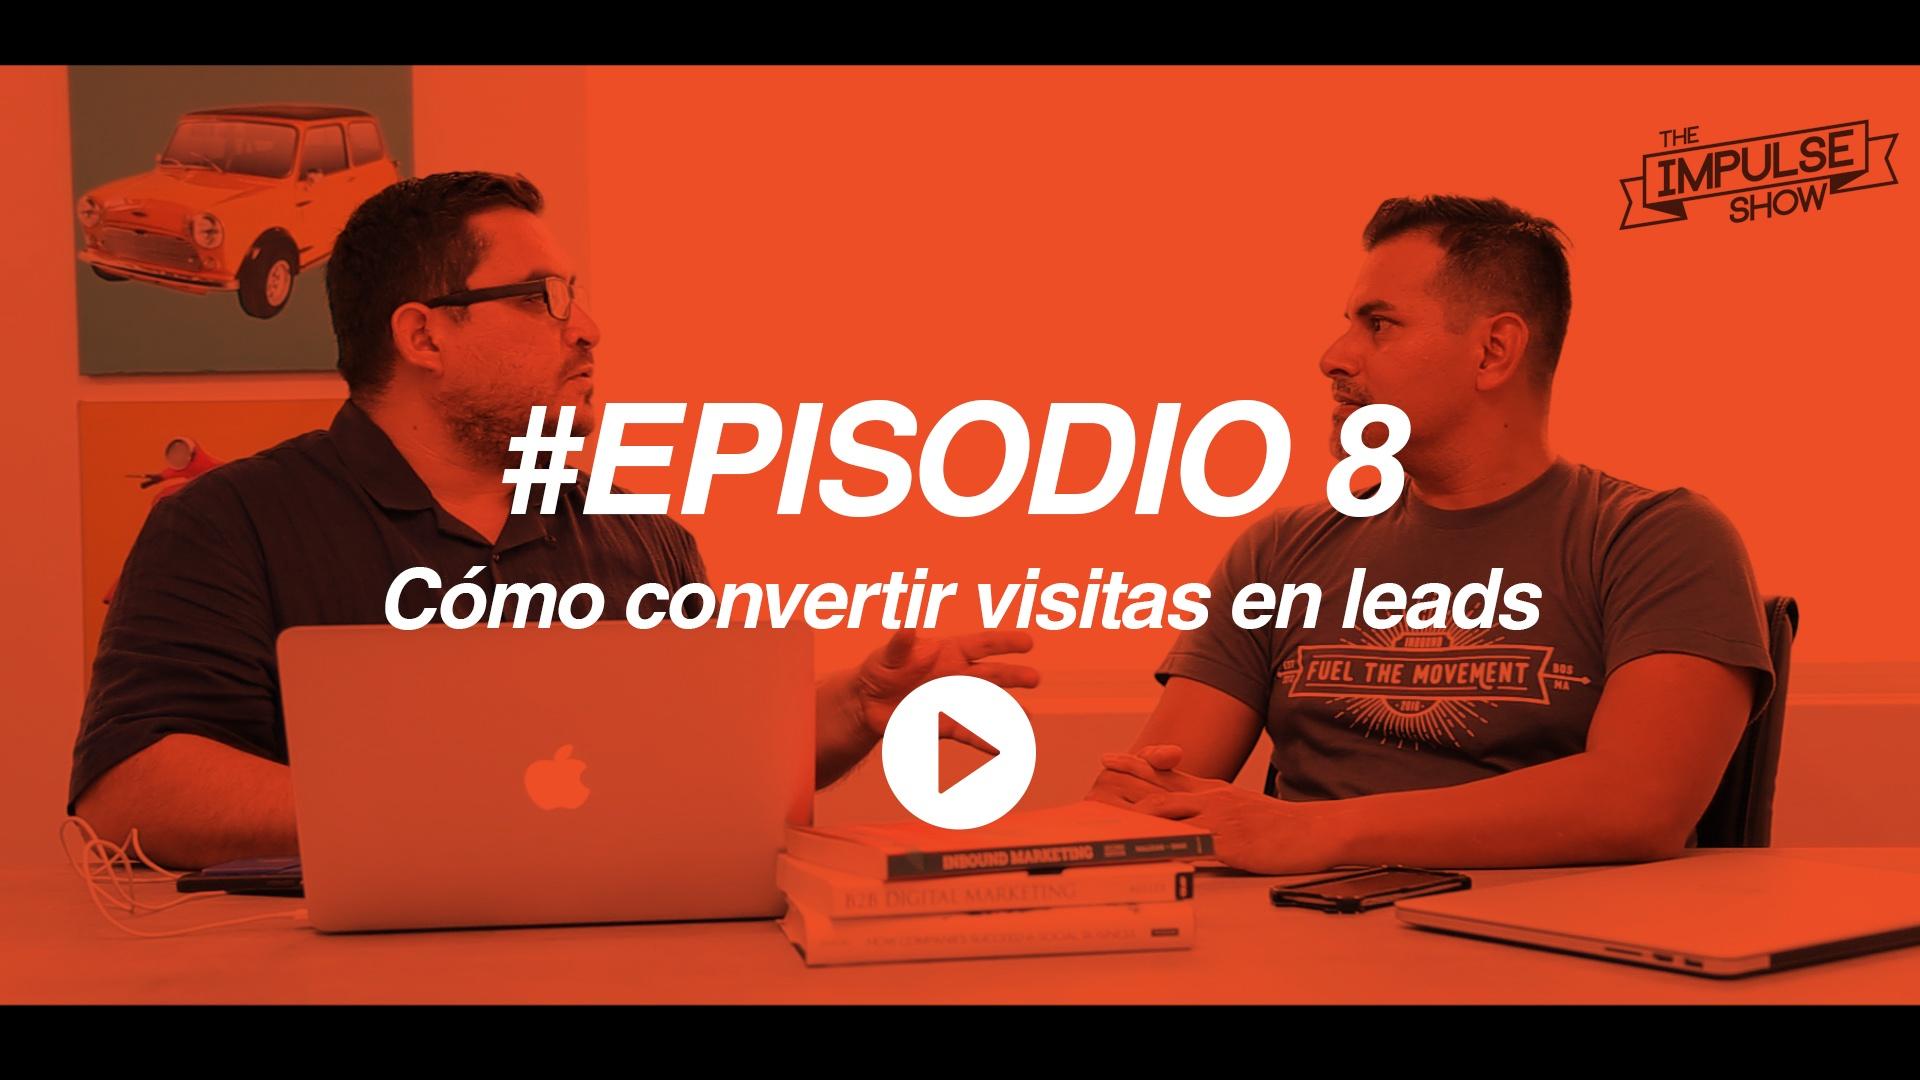 episodio-8-convertir-visitas-en-leads.jpg